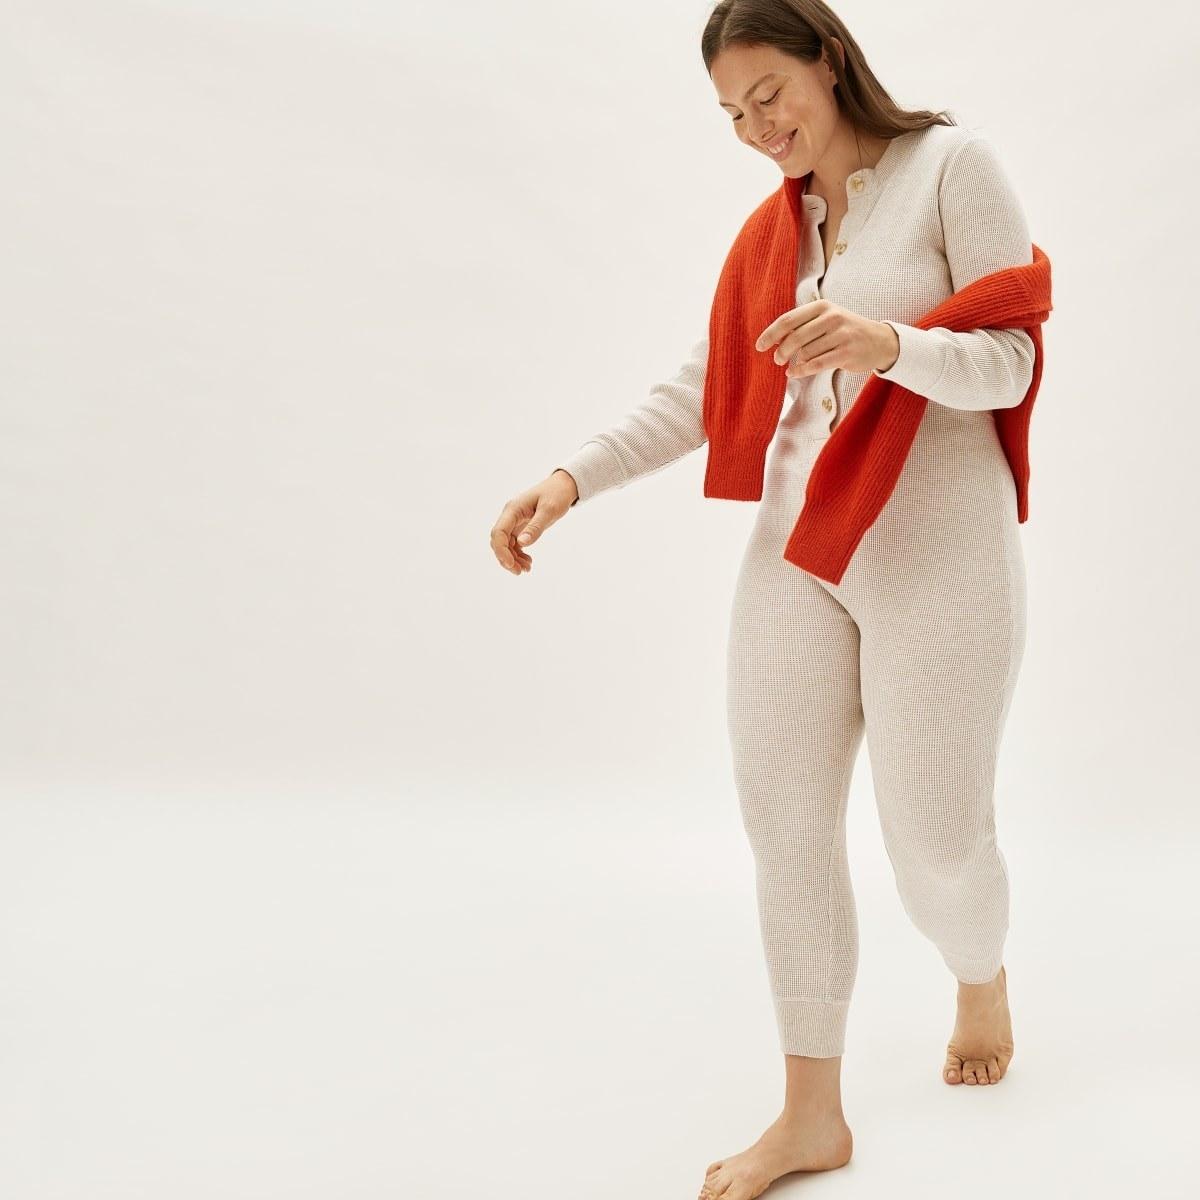 Model wearing the long-sleeve oatmeal color